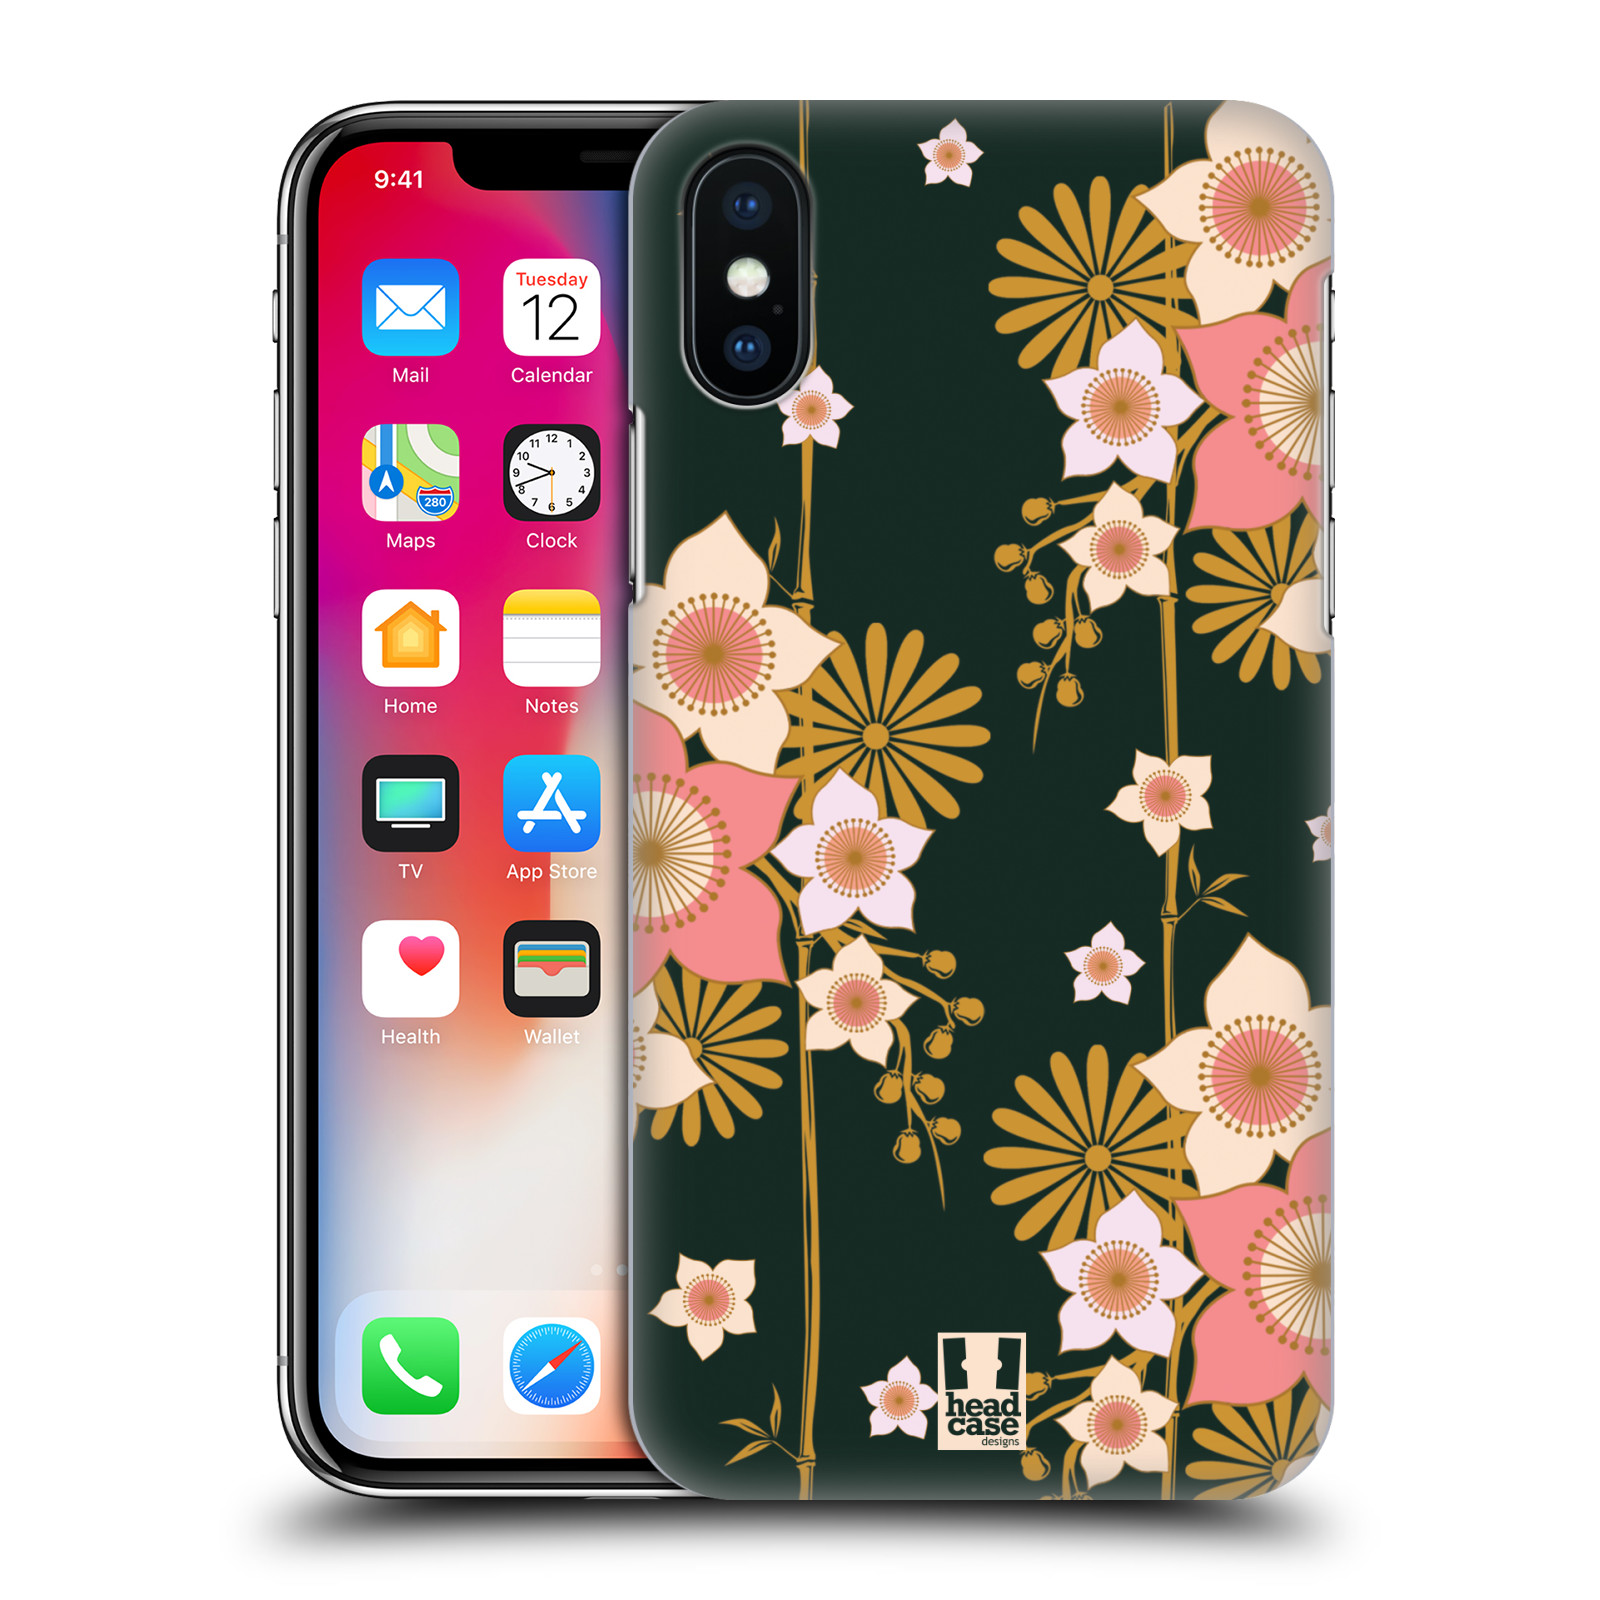 HEAD-CASE-DESIGNS-LACQUERWARE-HARD-BACK-CASE-FOR-APPLE-iPHONE-PHONES